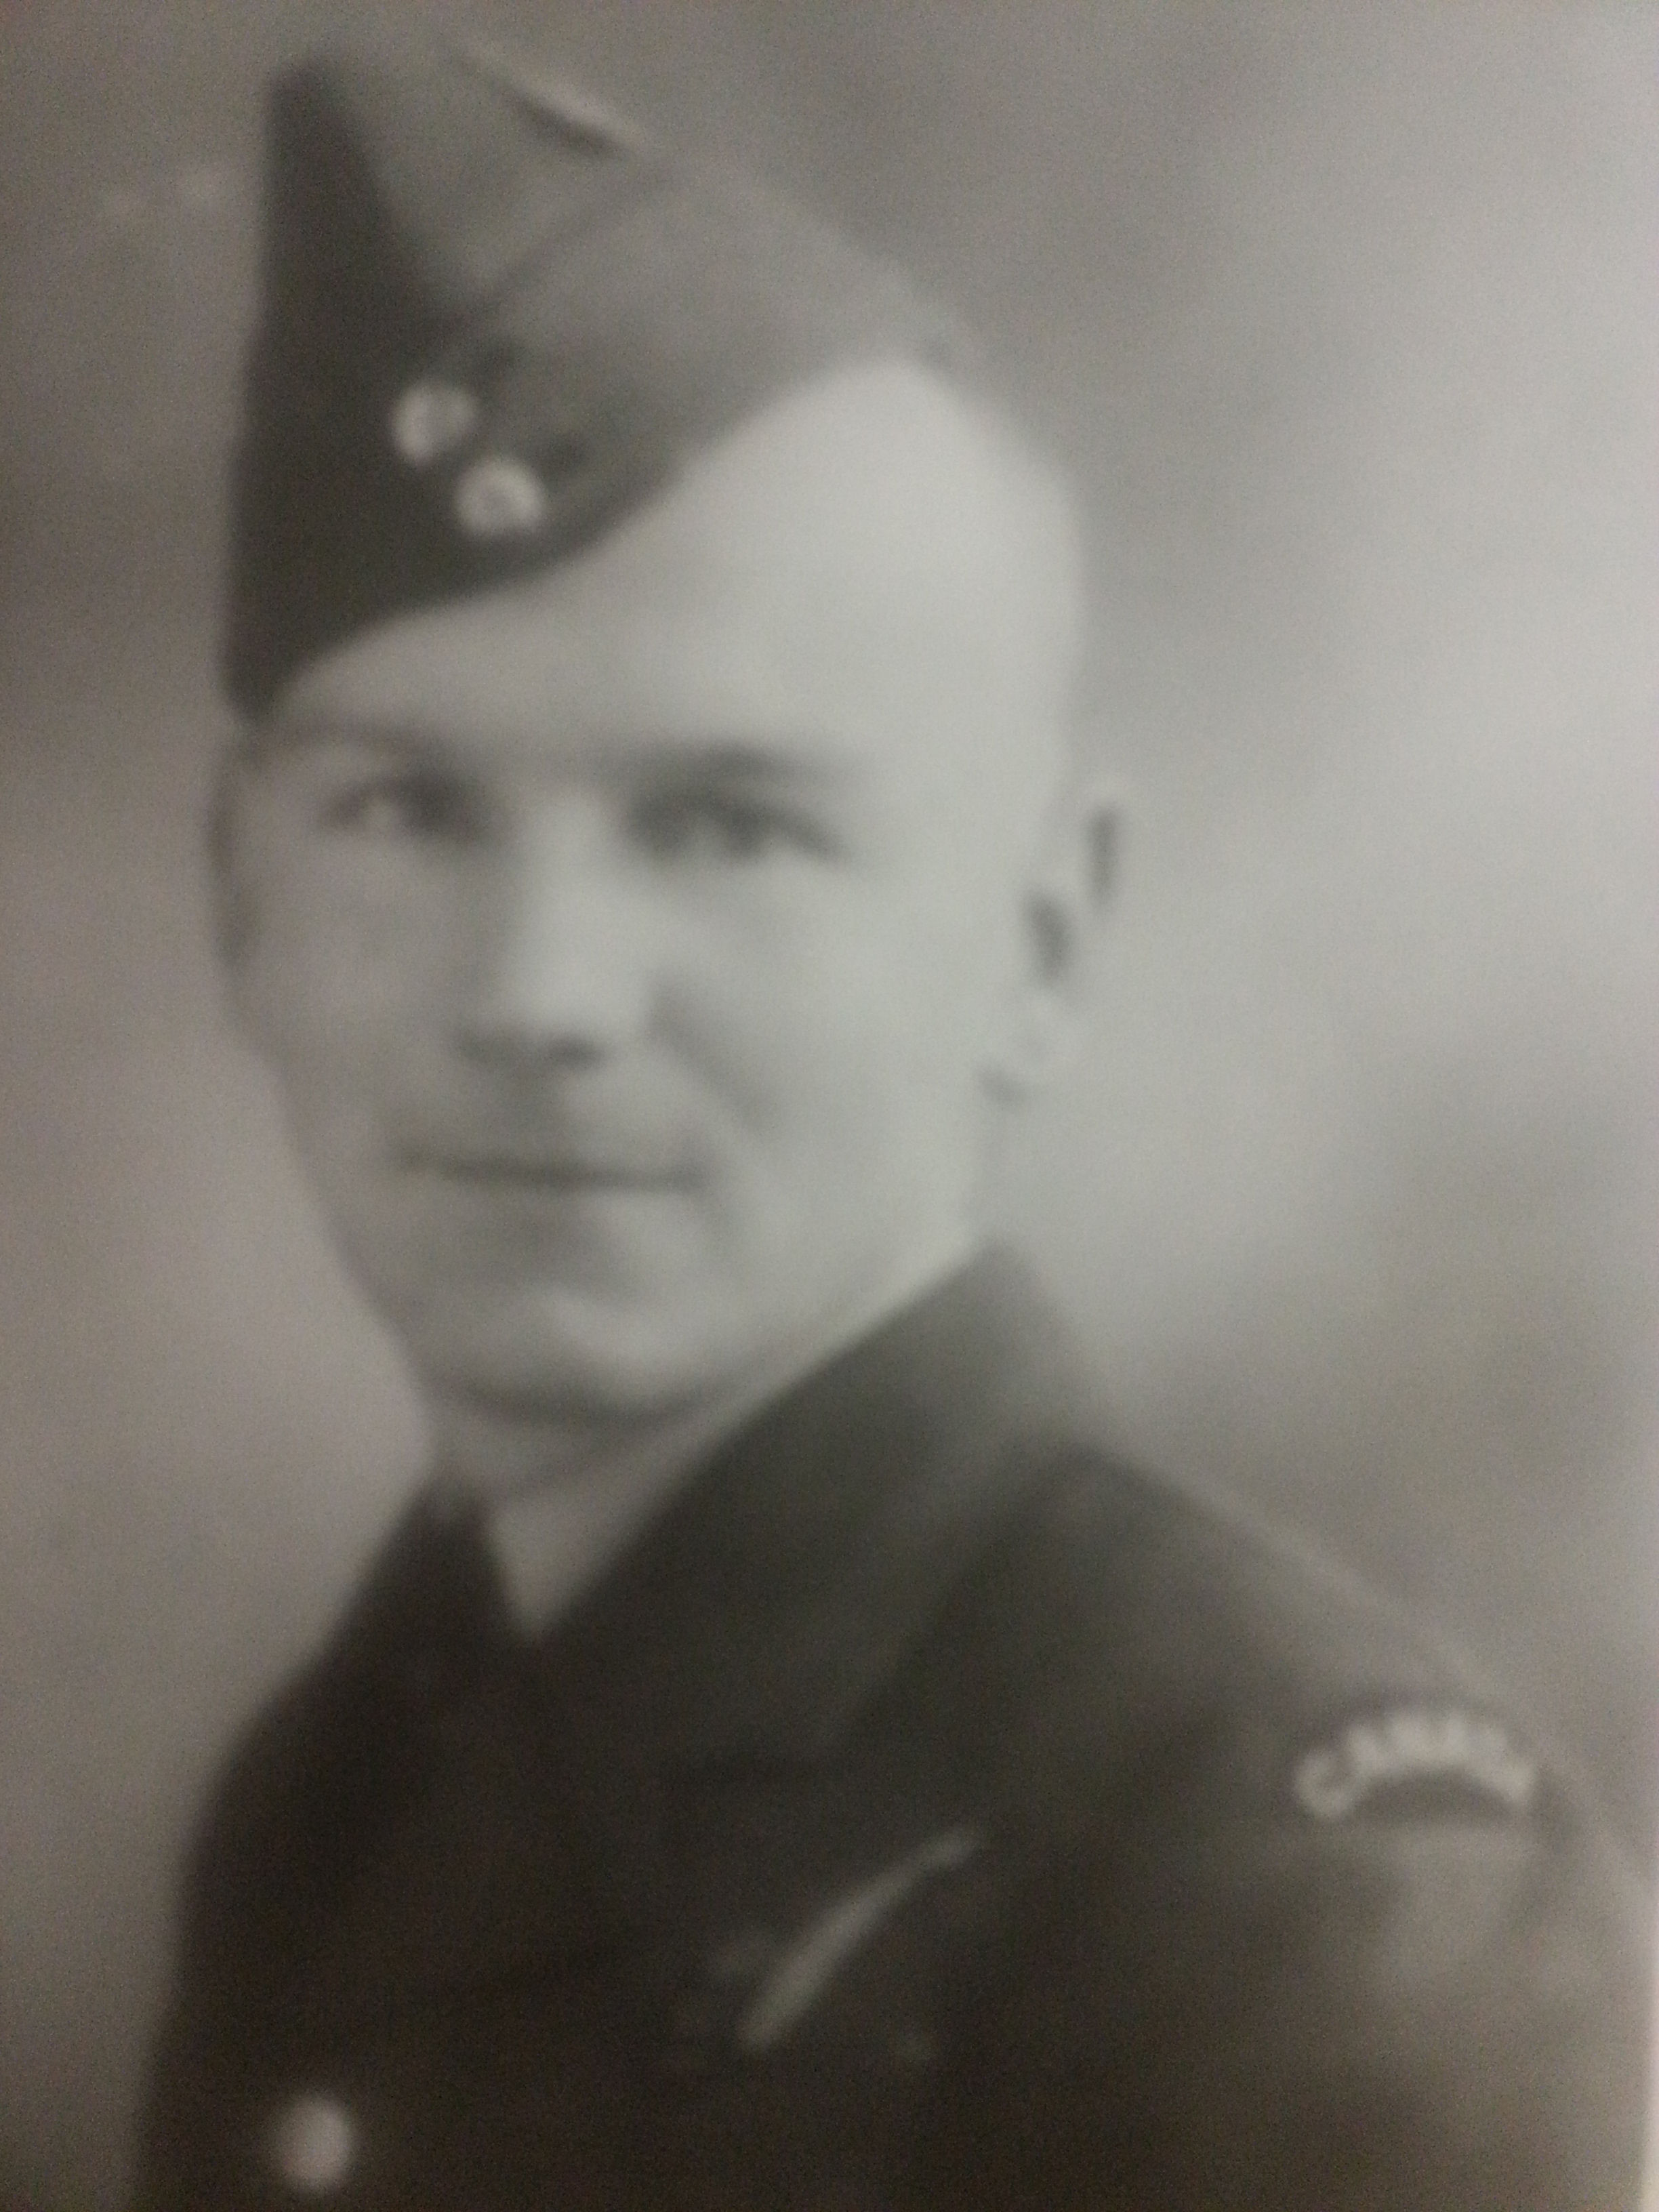 Photo of Vernon Edward Clark.